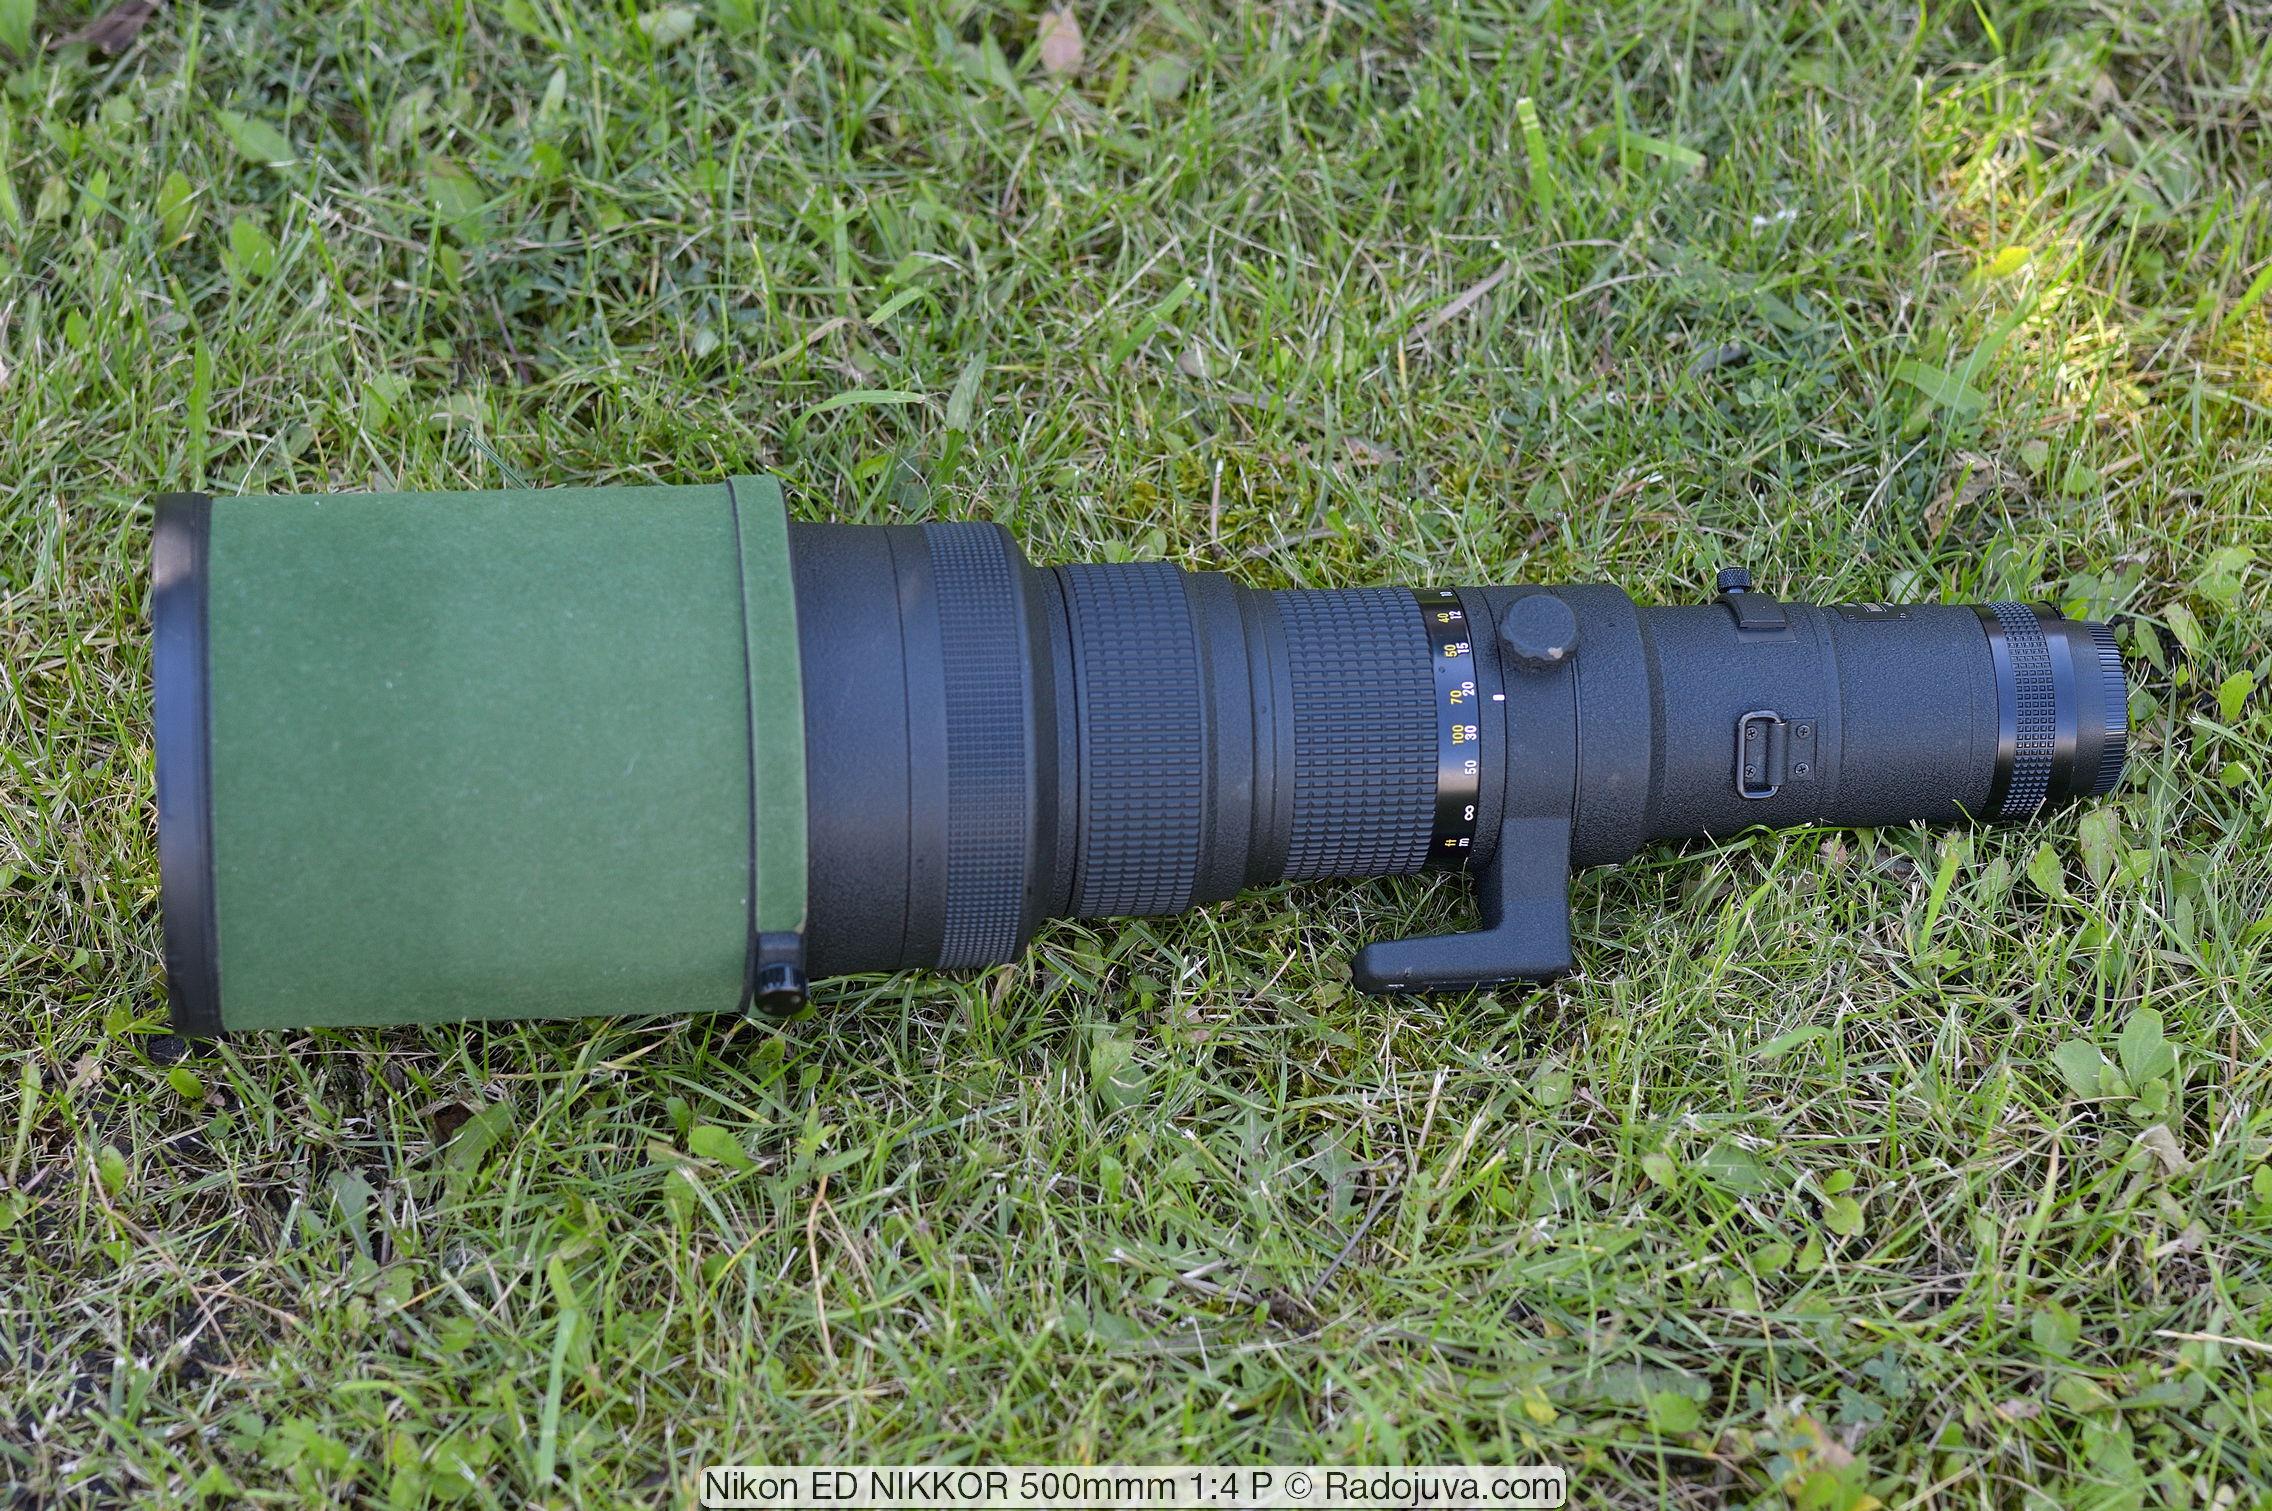 Nikon ED NIKKOR 500mmm 1:4 P